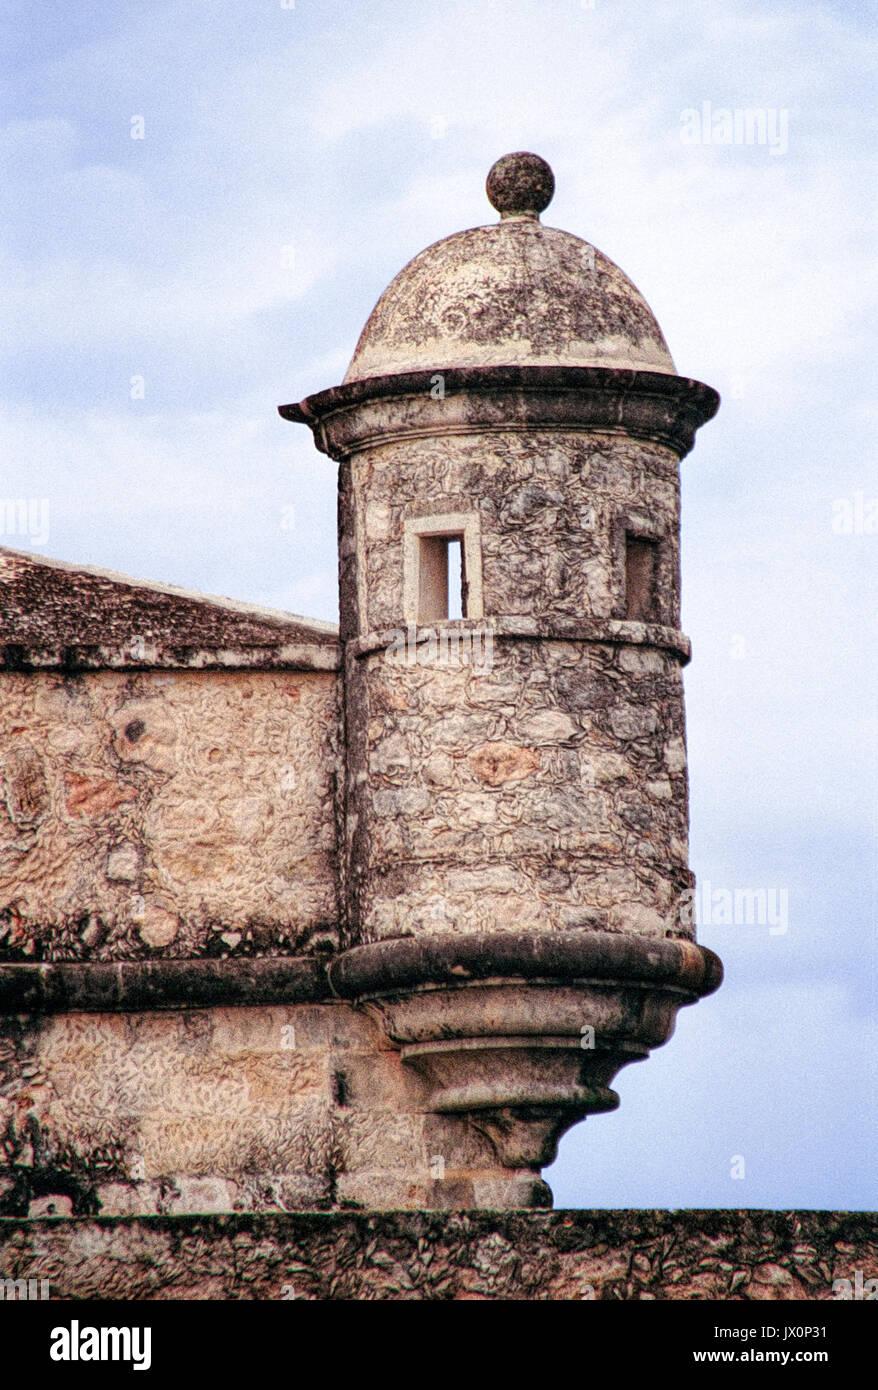 Fuerte de San Miguel or Fort St Michael in Campeche, Mexico. Turret or guard post. Vintage 1996 - kodak film. - Stock Image